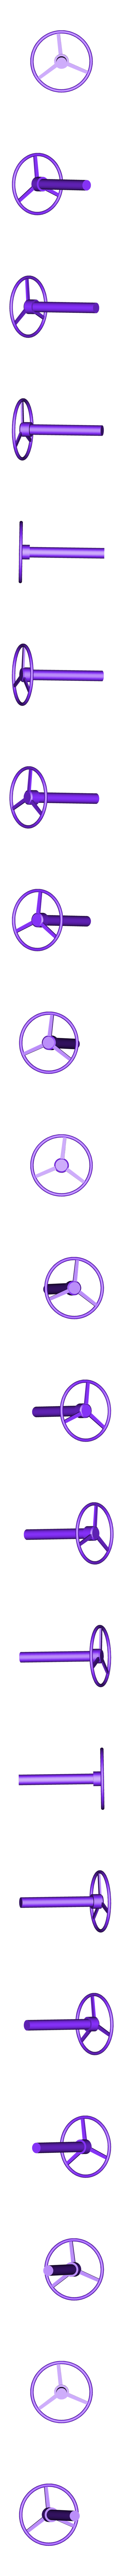 Steeringwheel-x-1.stl Download free STL file Army Jeep • Design to 3D print, 3DPrintingOne